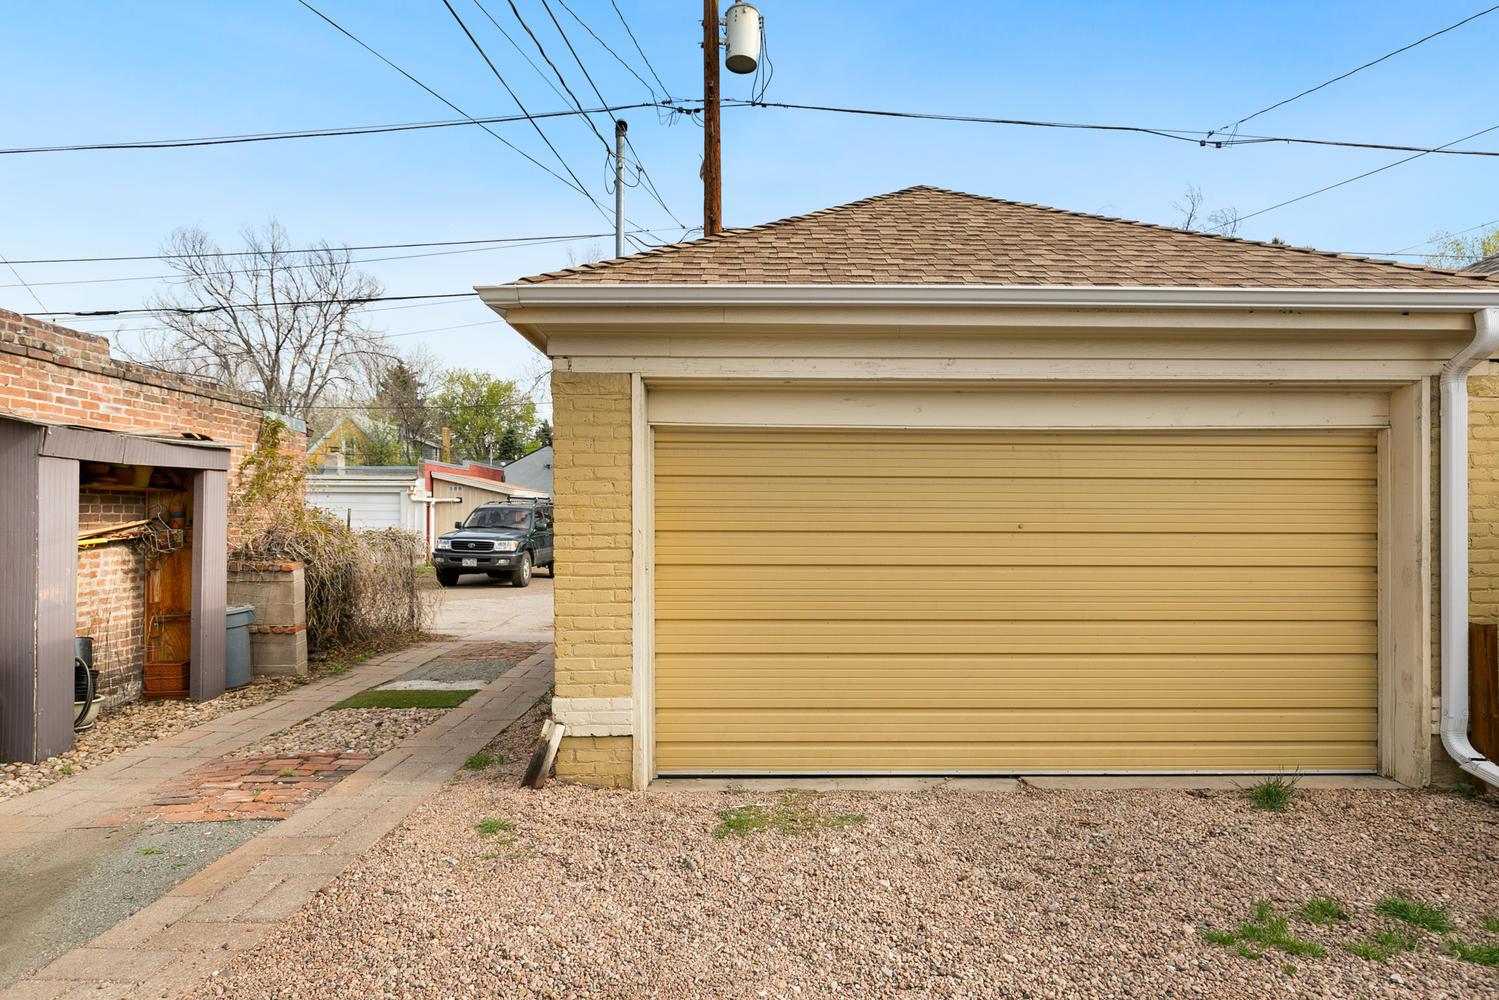 3223 W 22nd Ave Denver CO-large-032-32-32-1500x1000-72dpi.jpg